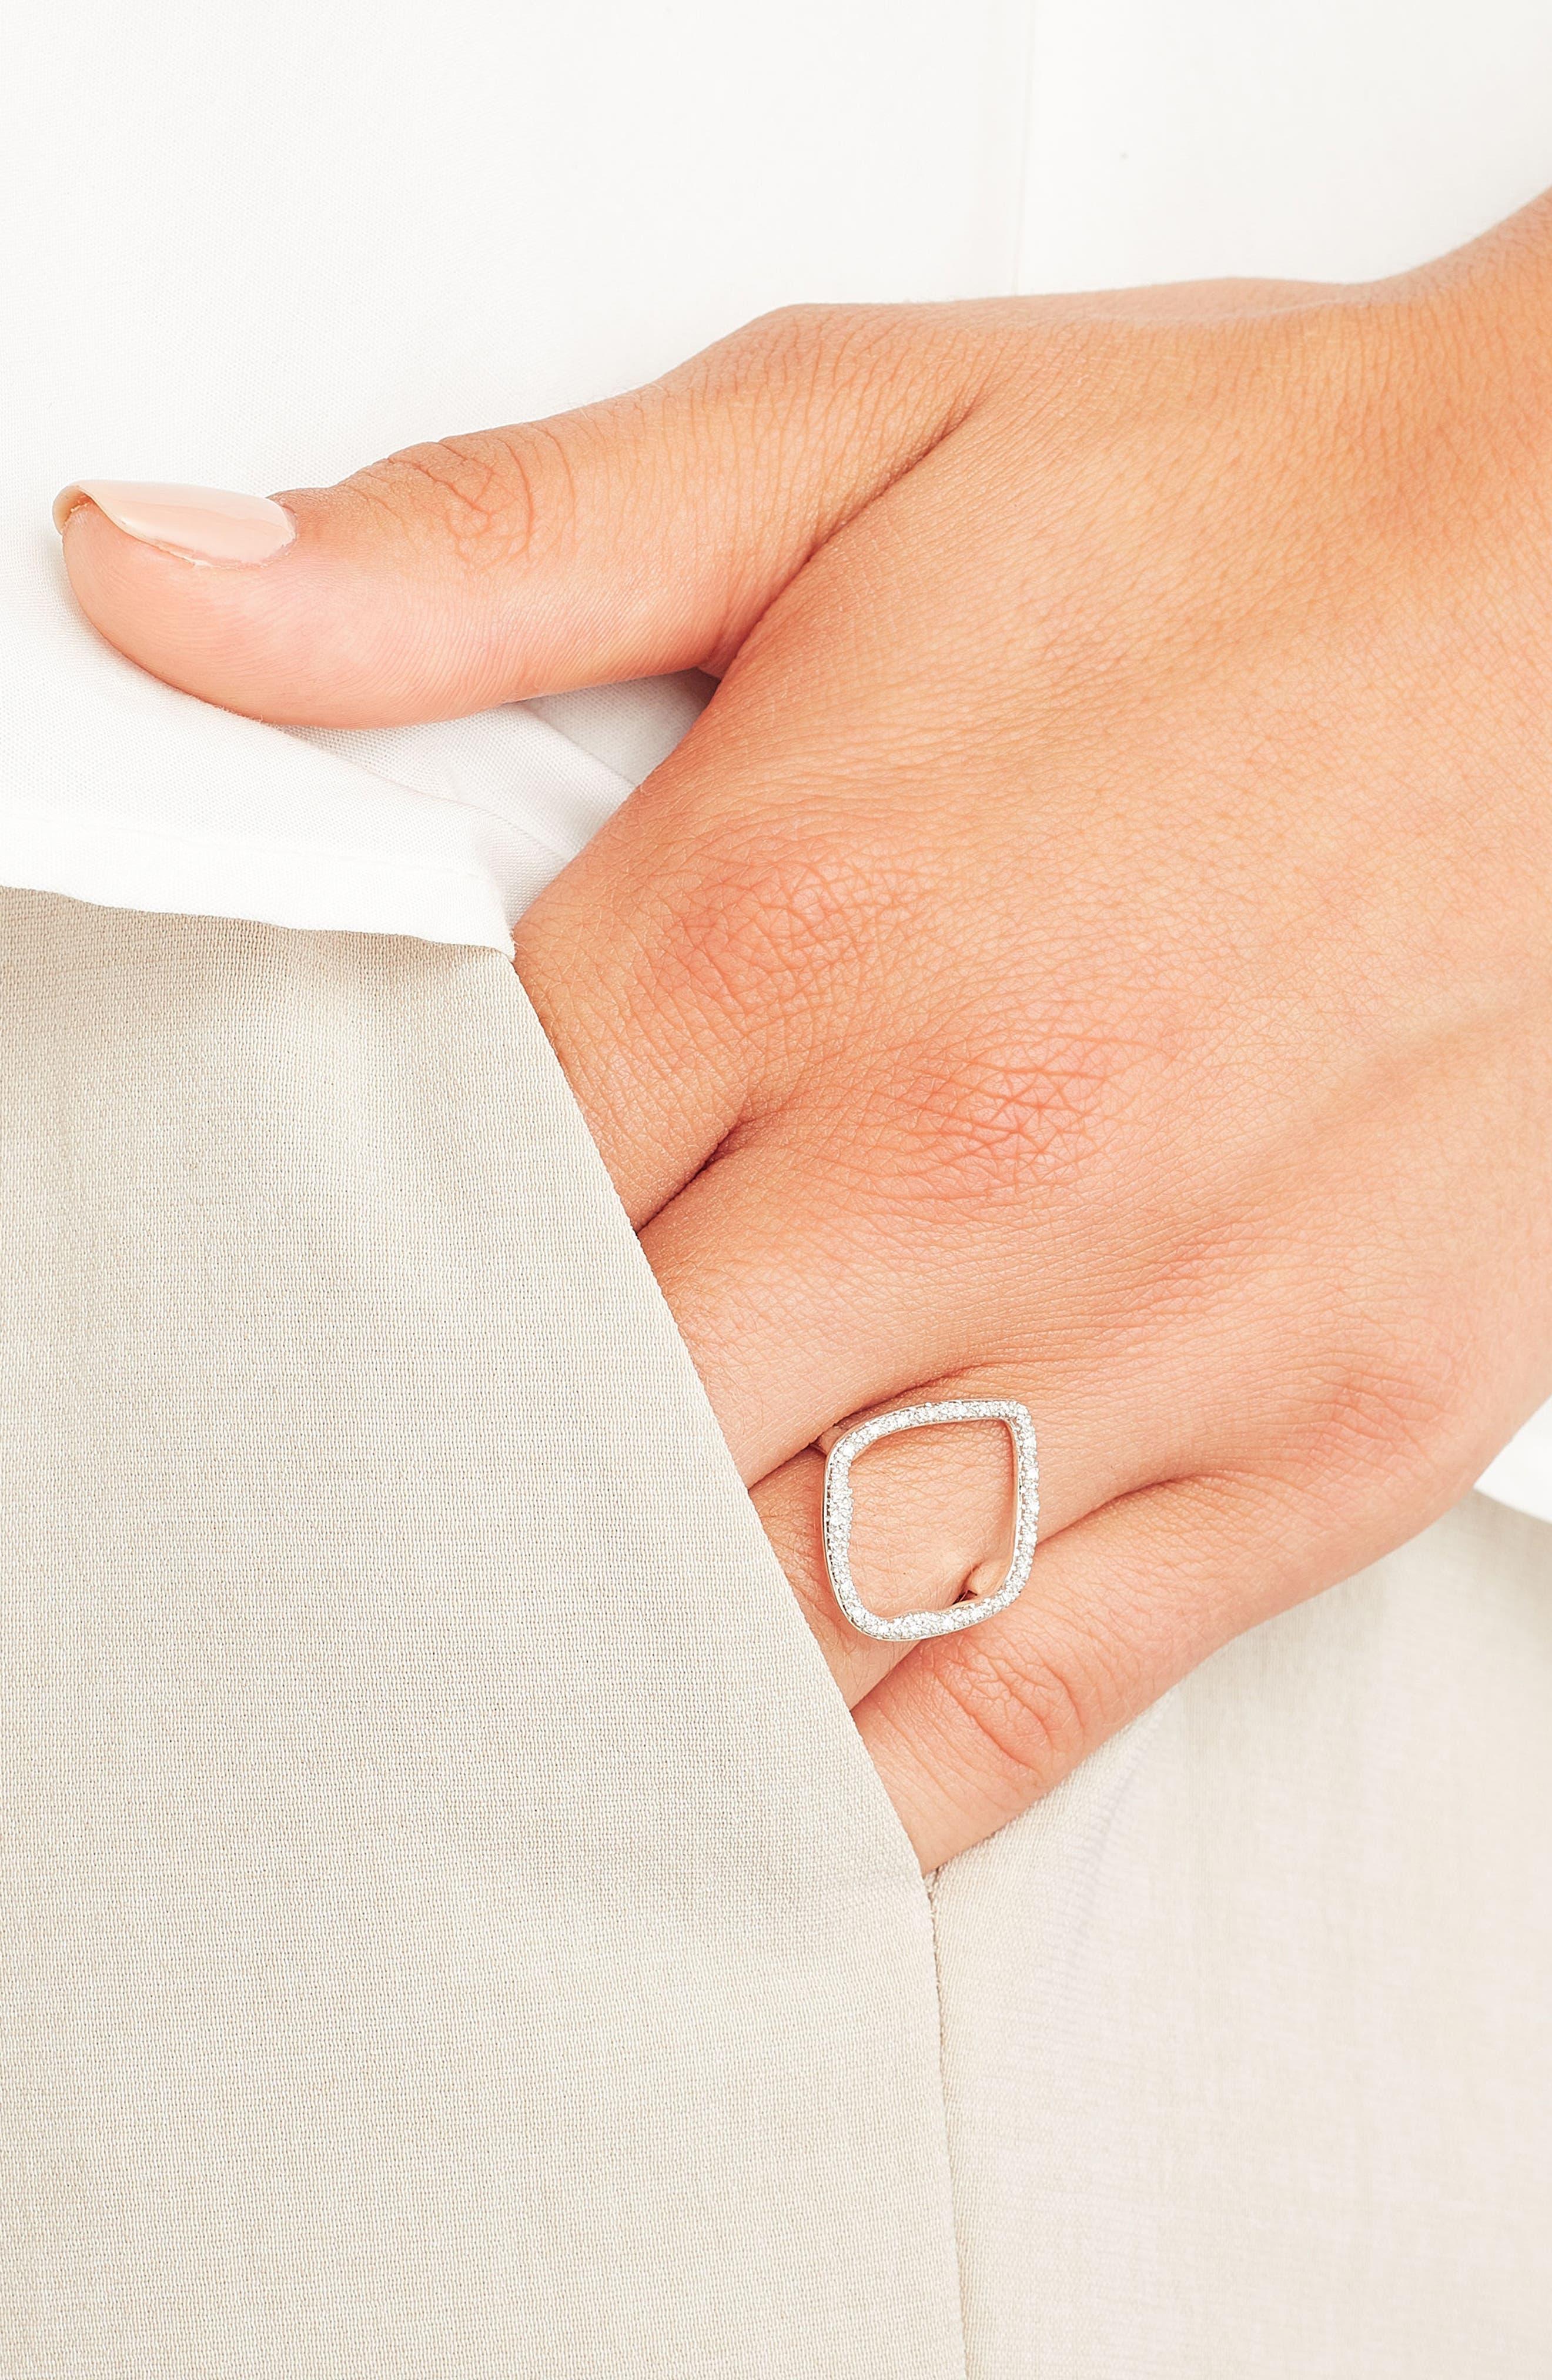 MONICA VINADER, Riva Hoop Diamond Ring, Alternate thumbnail 3, color, SILVER